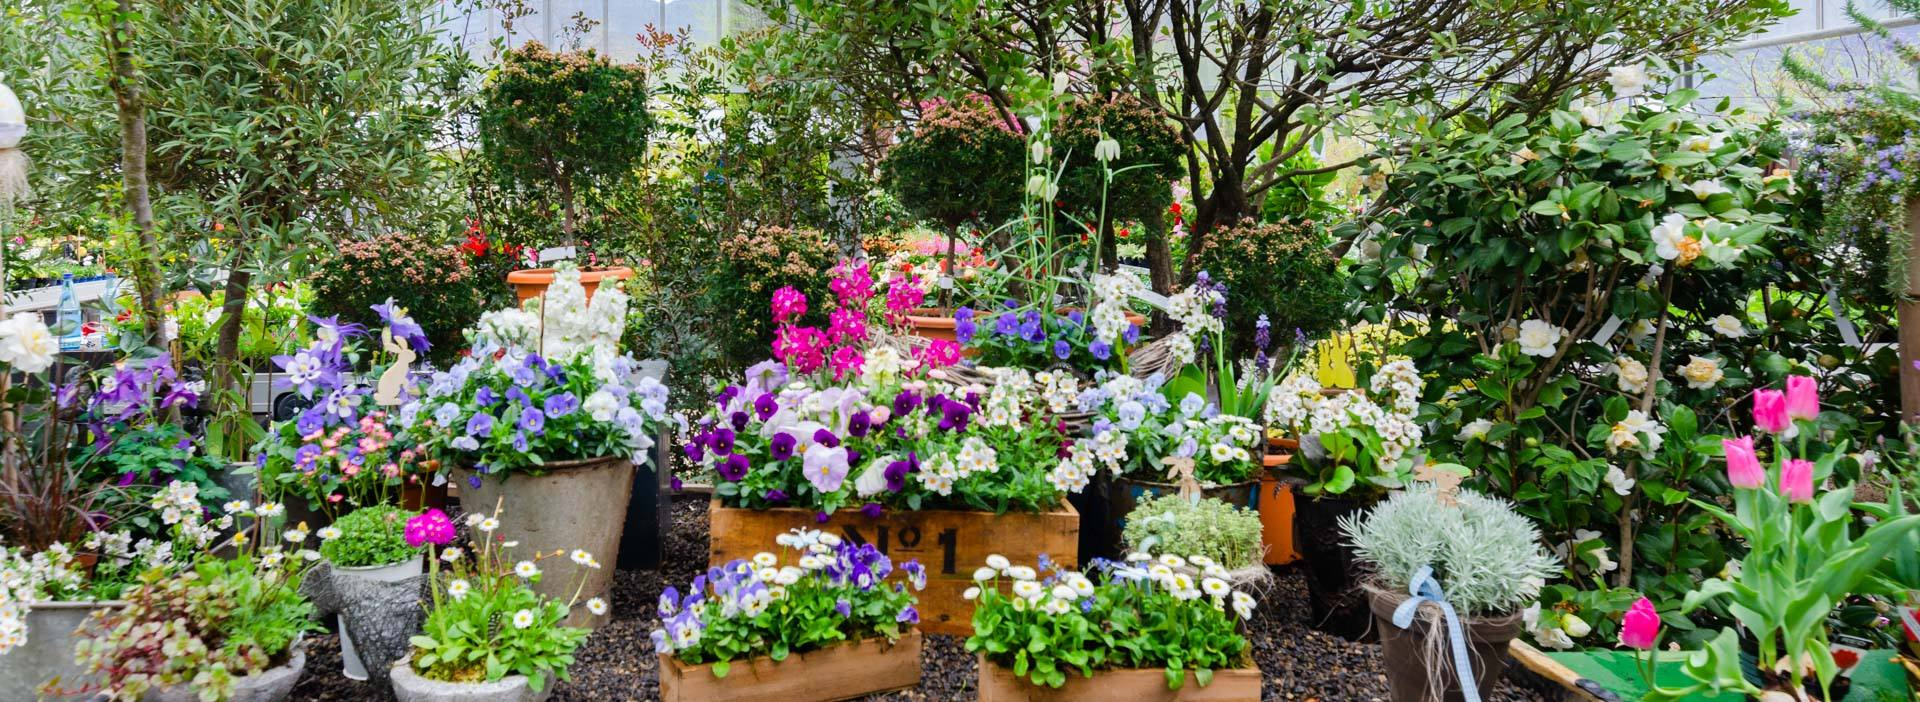 Giardineria Galanthus